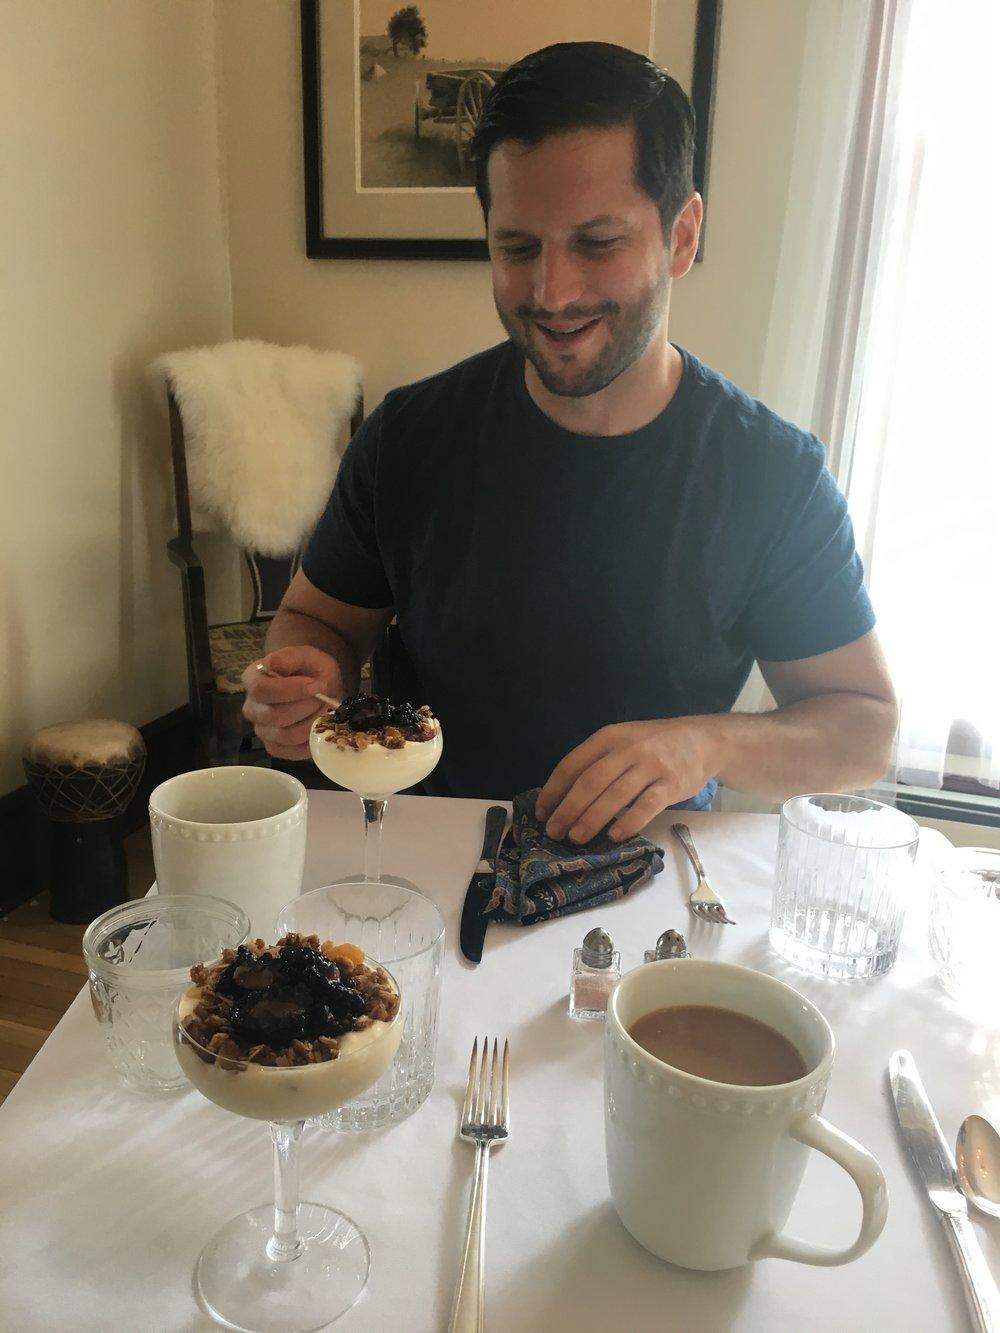 My husband,enjoying breakfast!